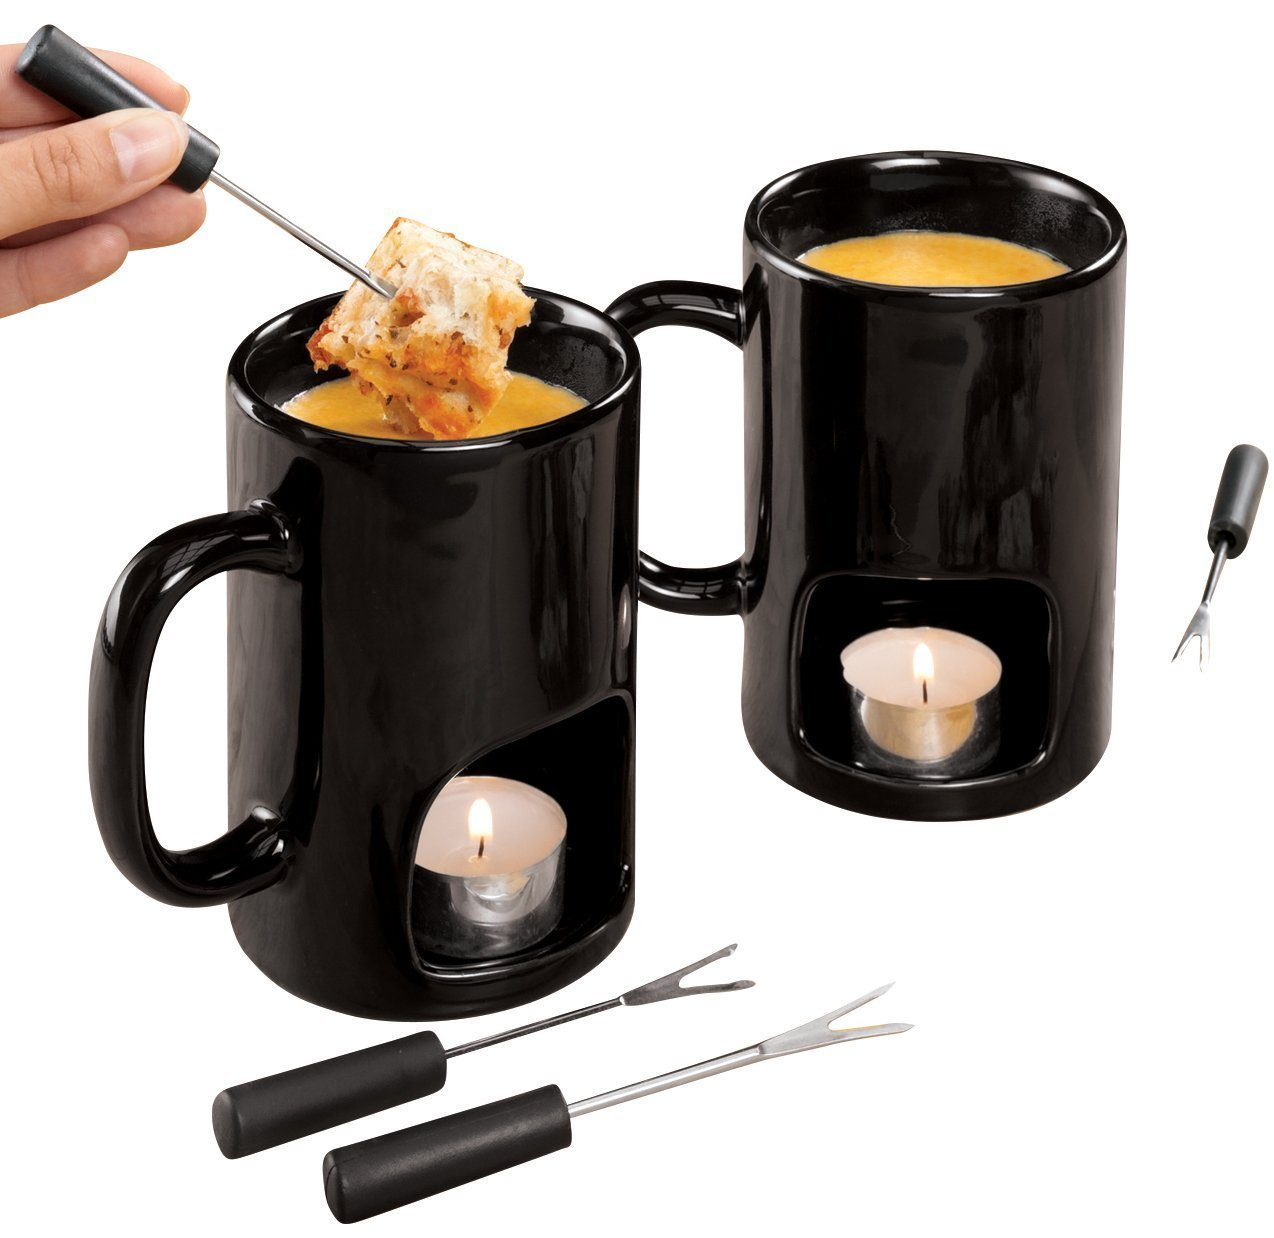 fondue for two set